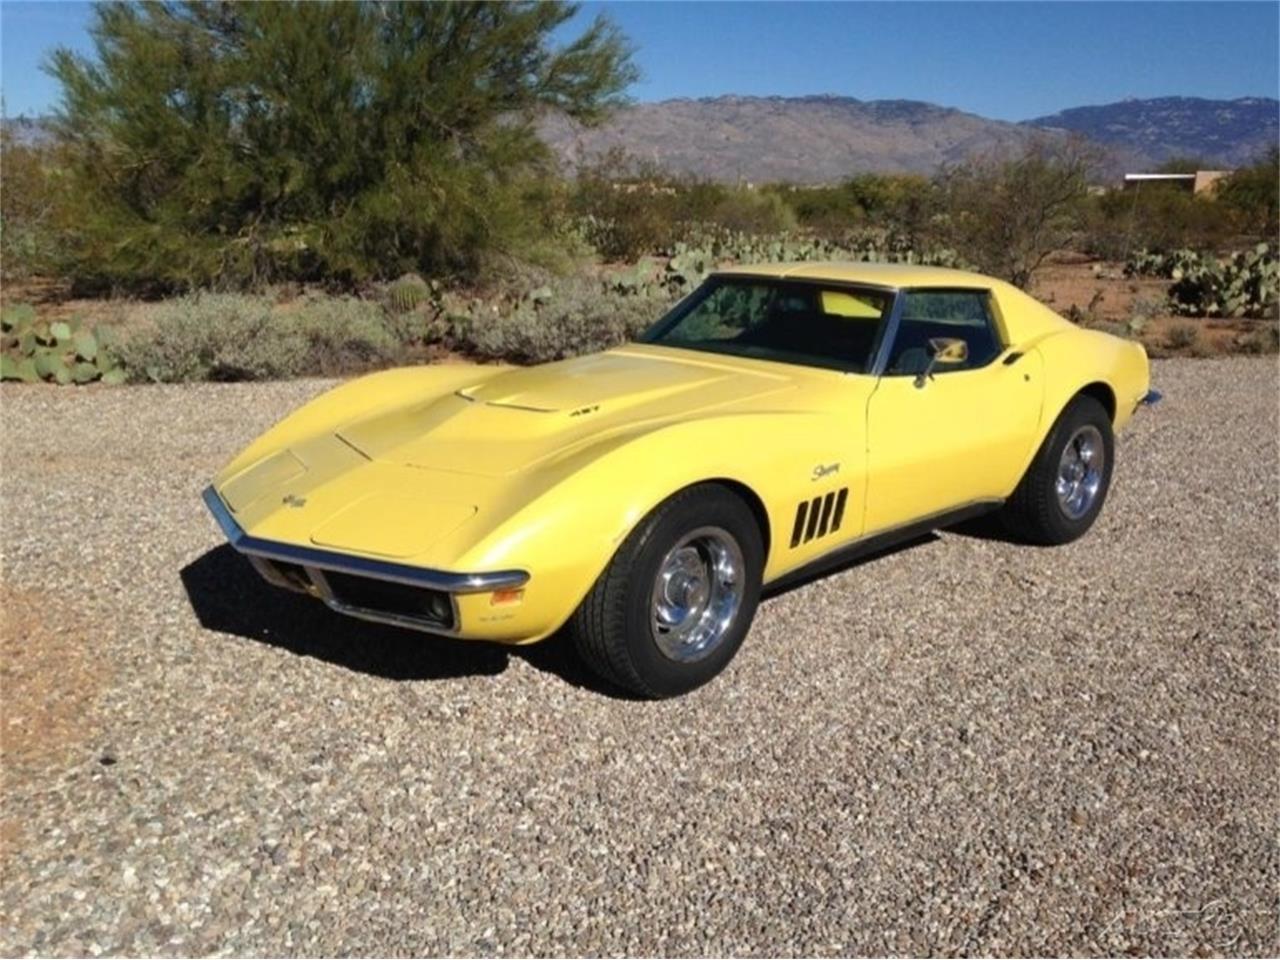 Corvette Stingray 1969 >> 1969 Chevrolet Corvette For Sale Classiccars Com Cc 849230